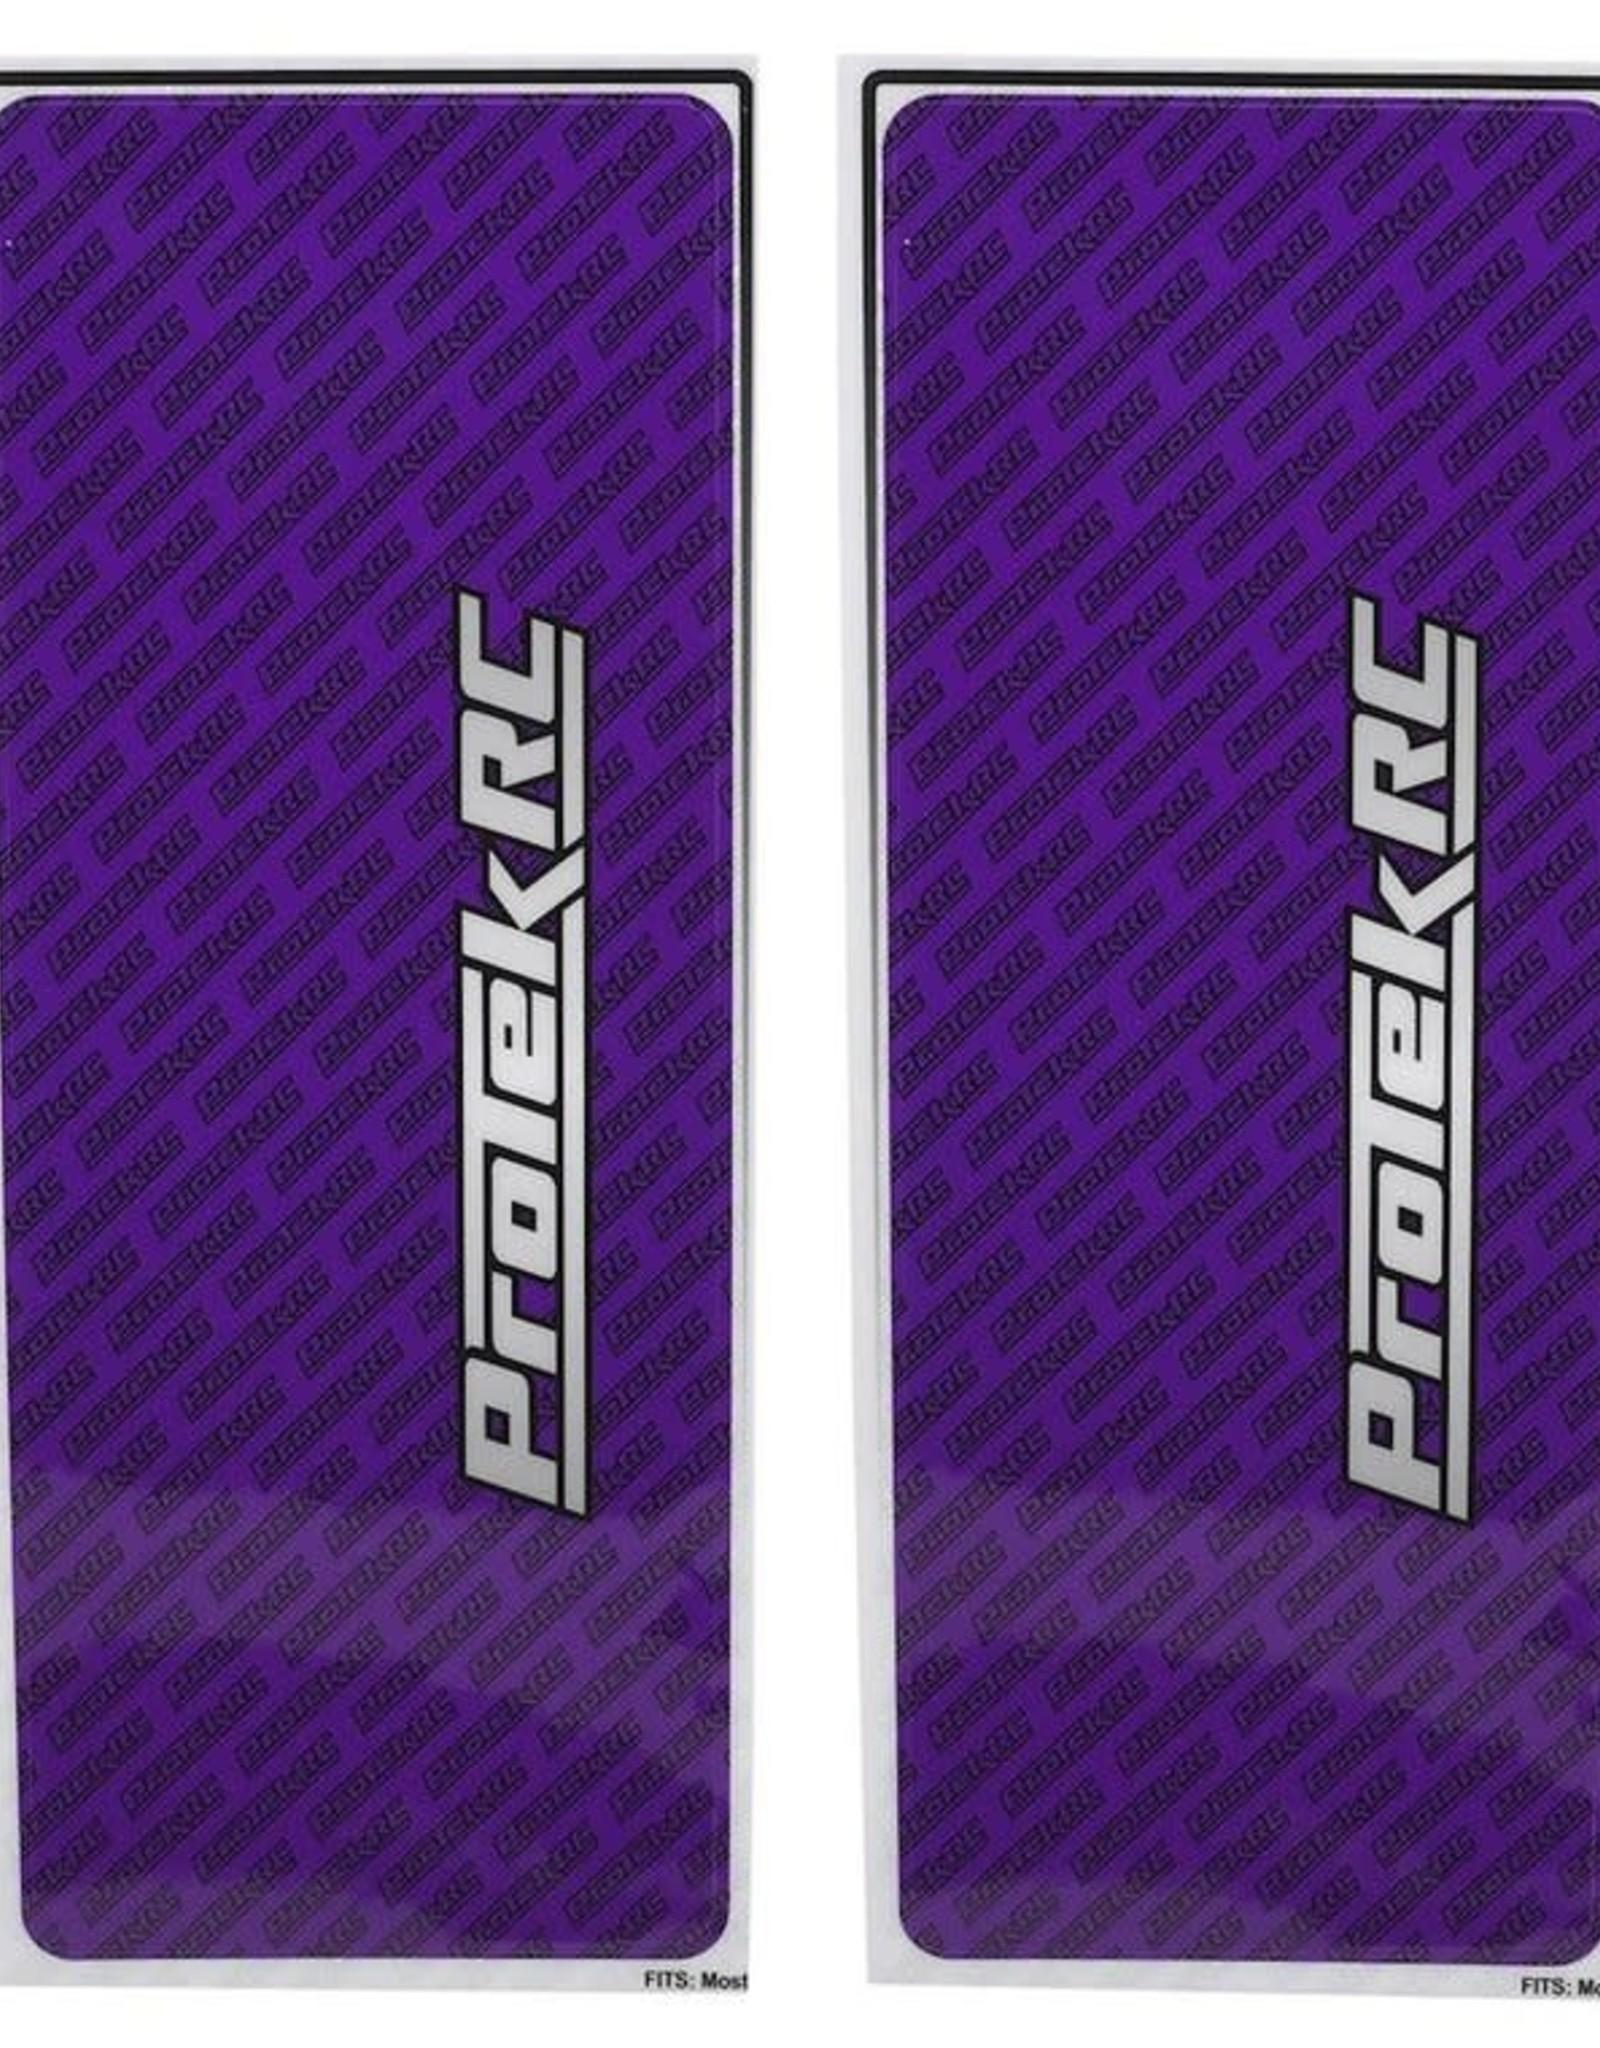 Protek RC ProTek RC Universal Chassis Protective Sheet (Purple) (2) (12.5x33.5cm)